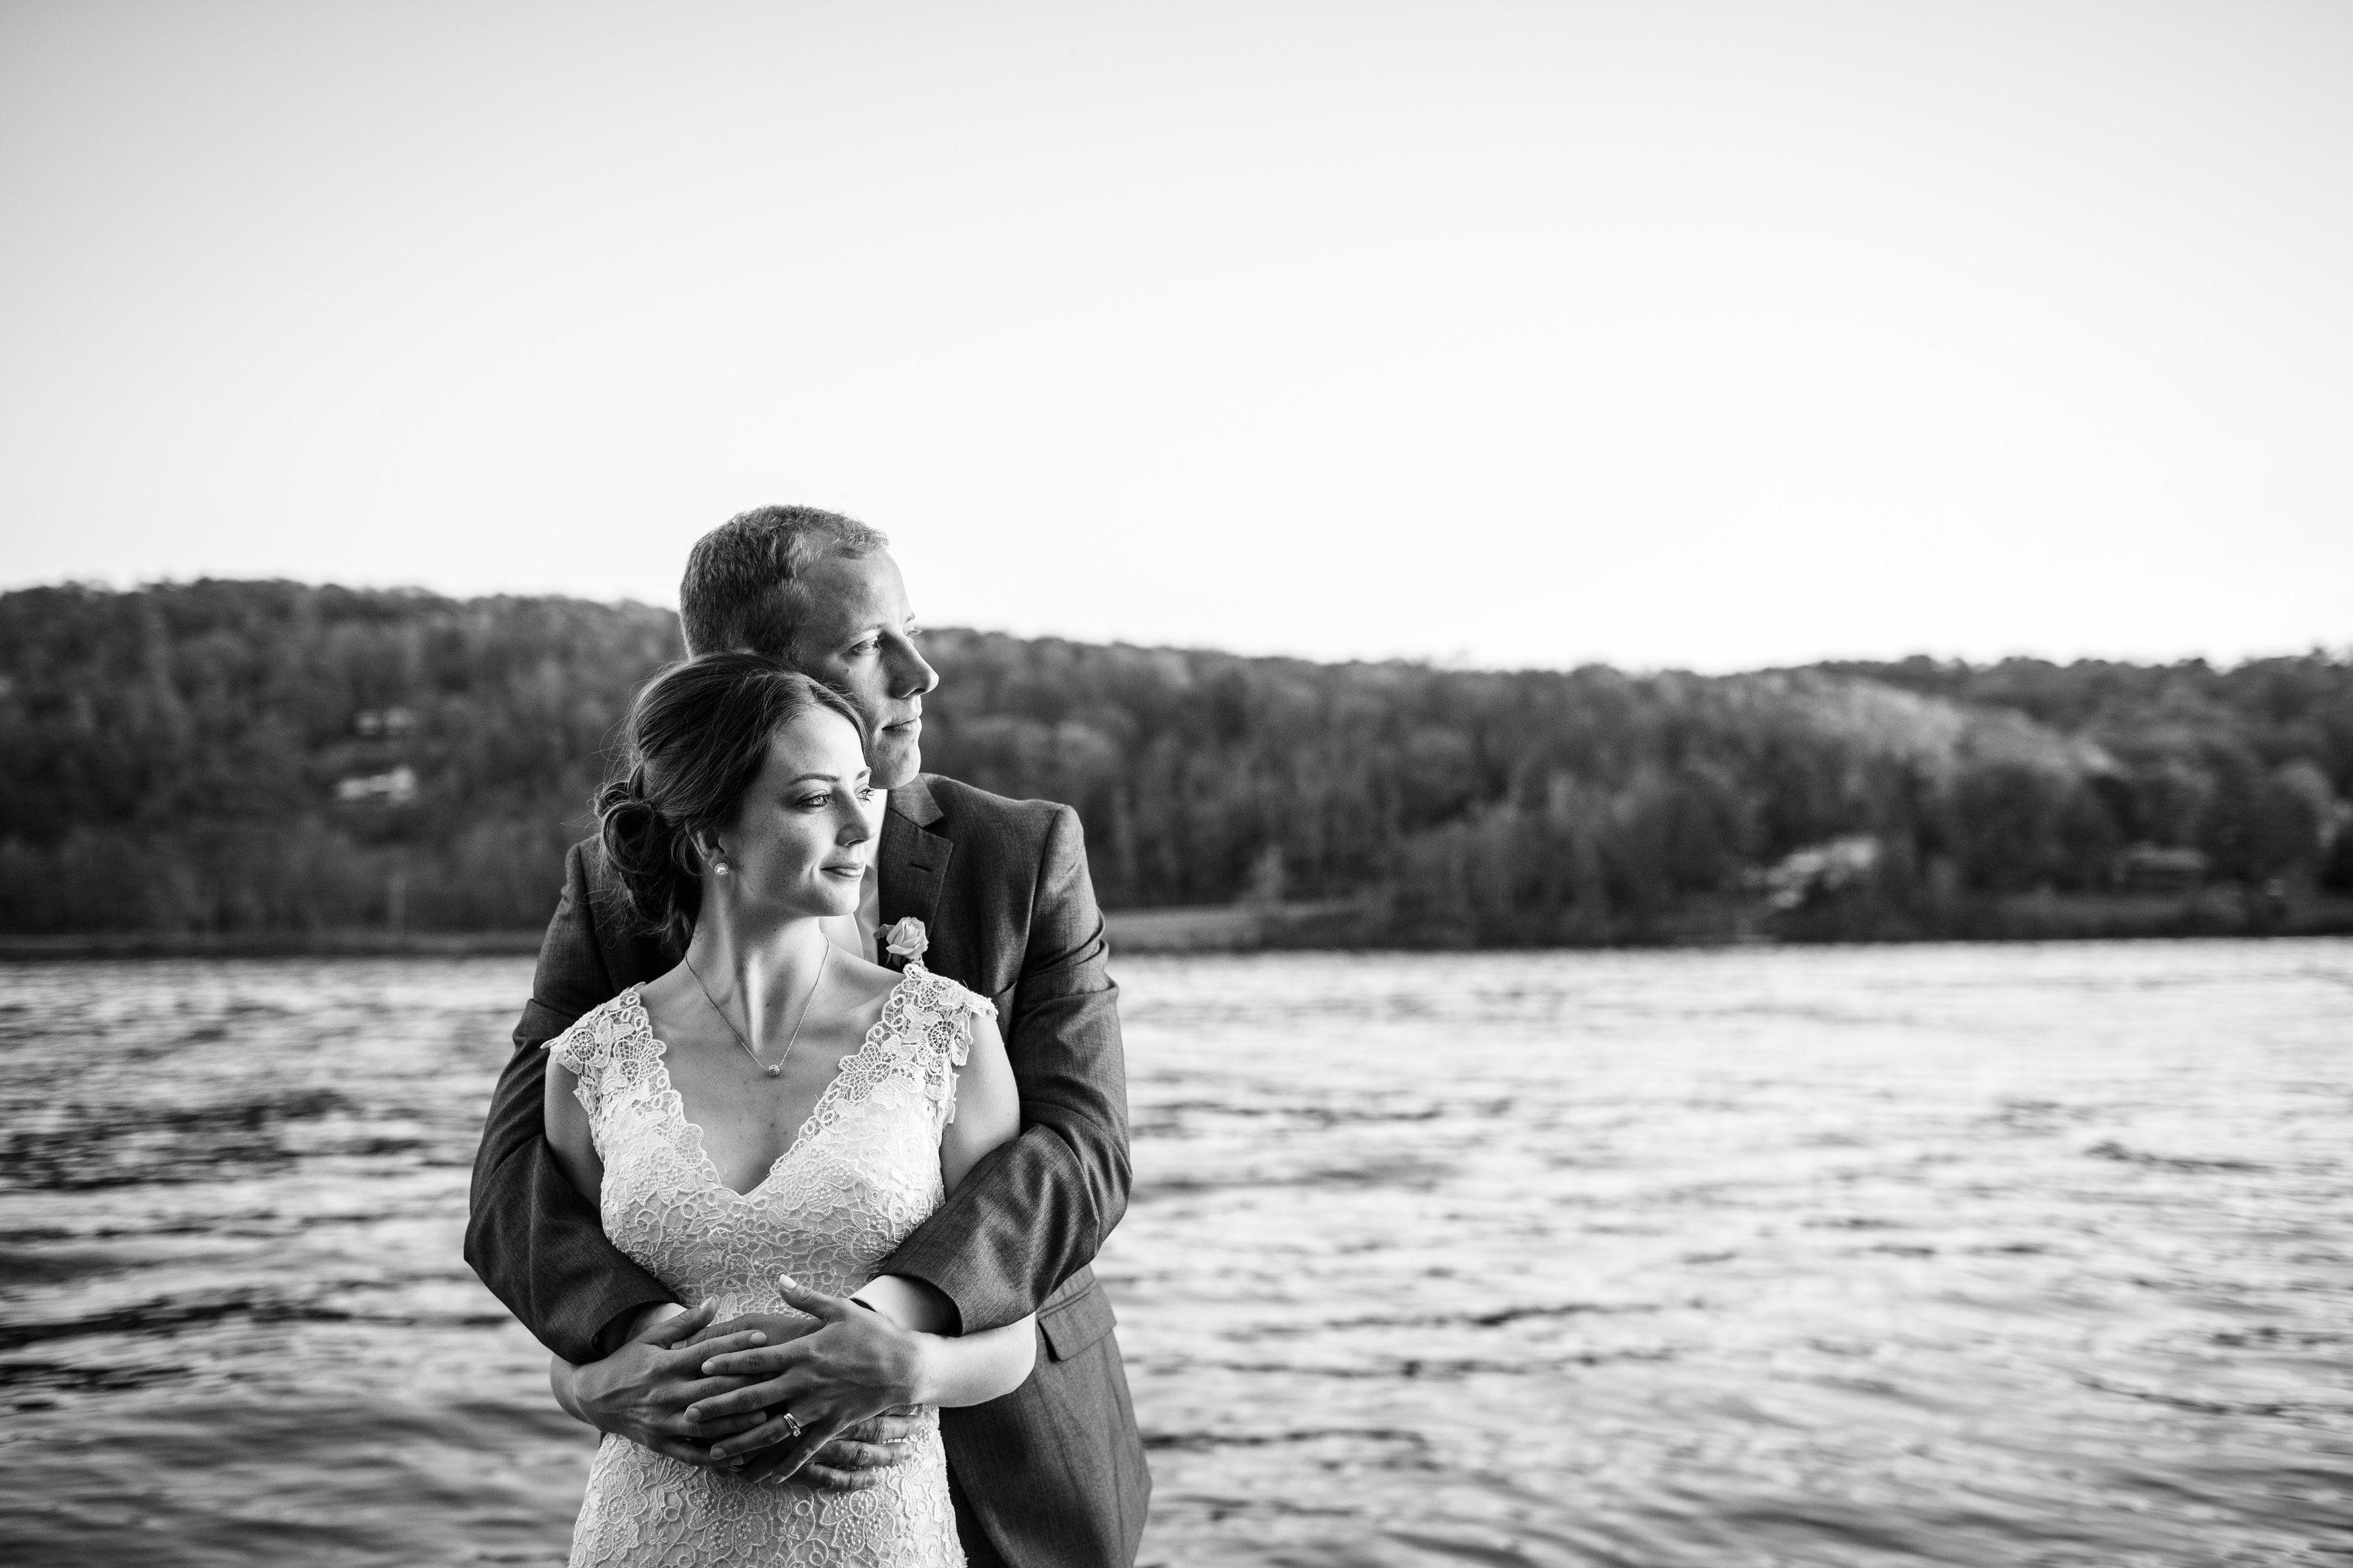 #Weddings #DeepCreekLake #MDBrides #beautifulbrideandgroom #mdbride  #DCL #DeepCreekLakeWeddings